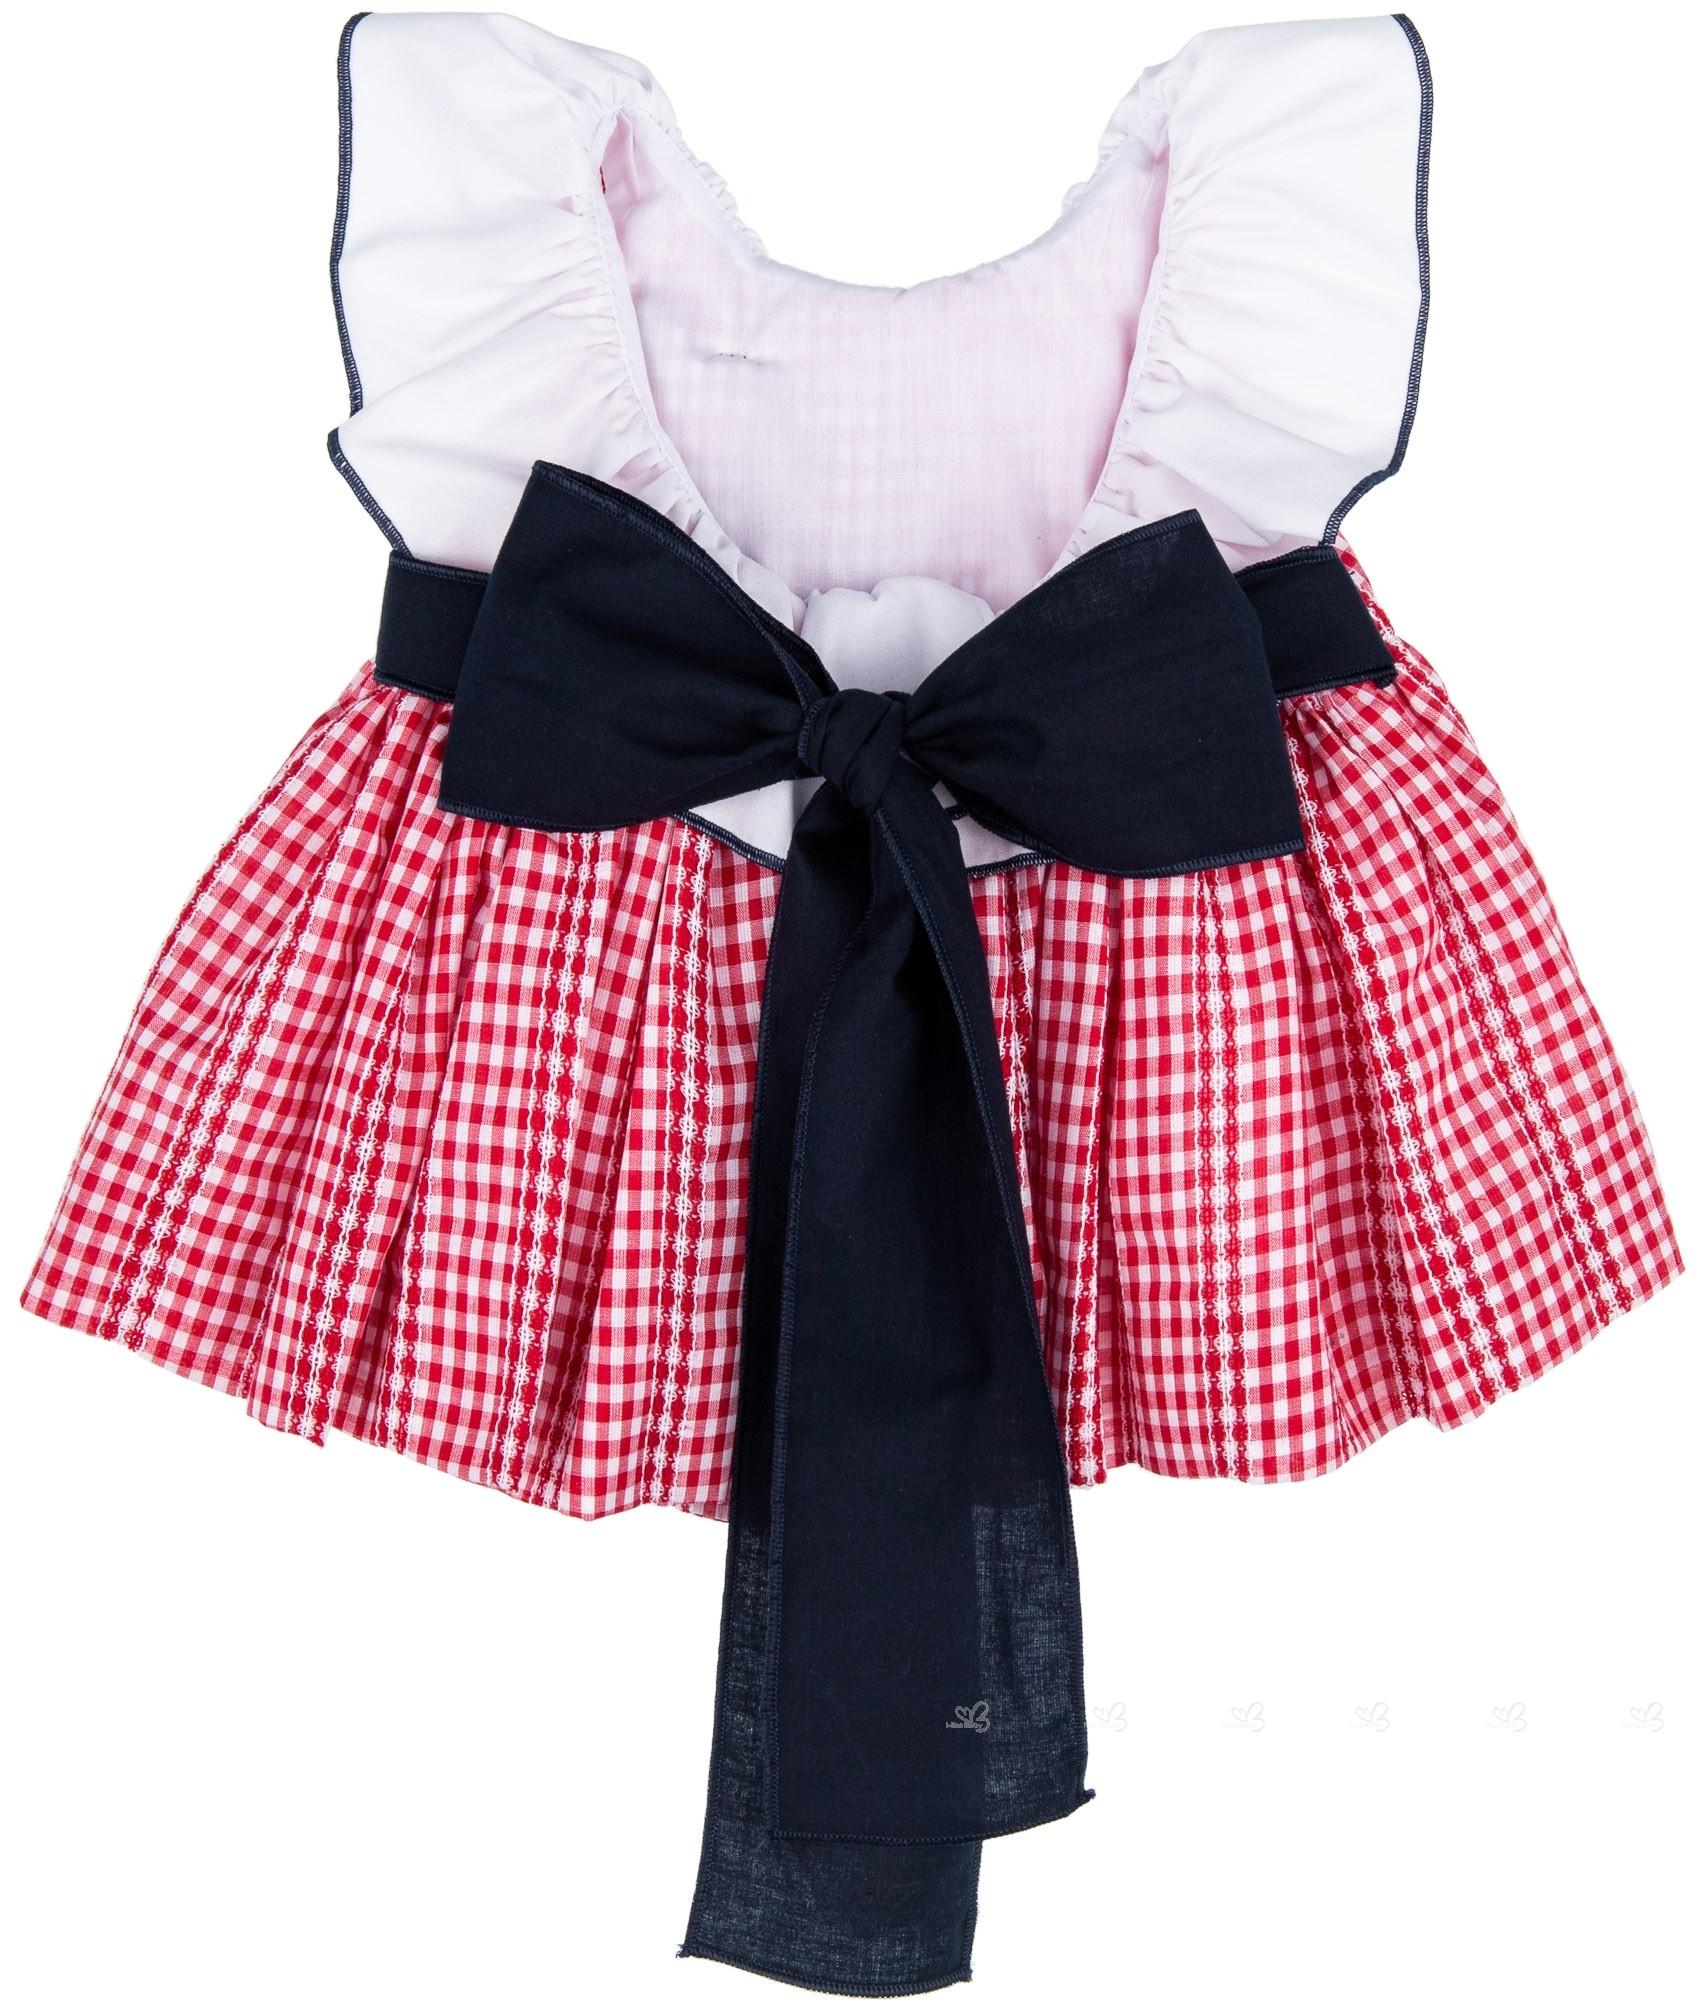 ba5daad6e6f ... Lappepa Moda Infantil Conjunto Niña 2 Piezas Vestido Vichy Rojo    Braguita Doble Volante ...